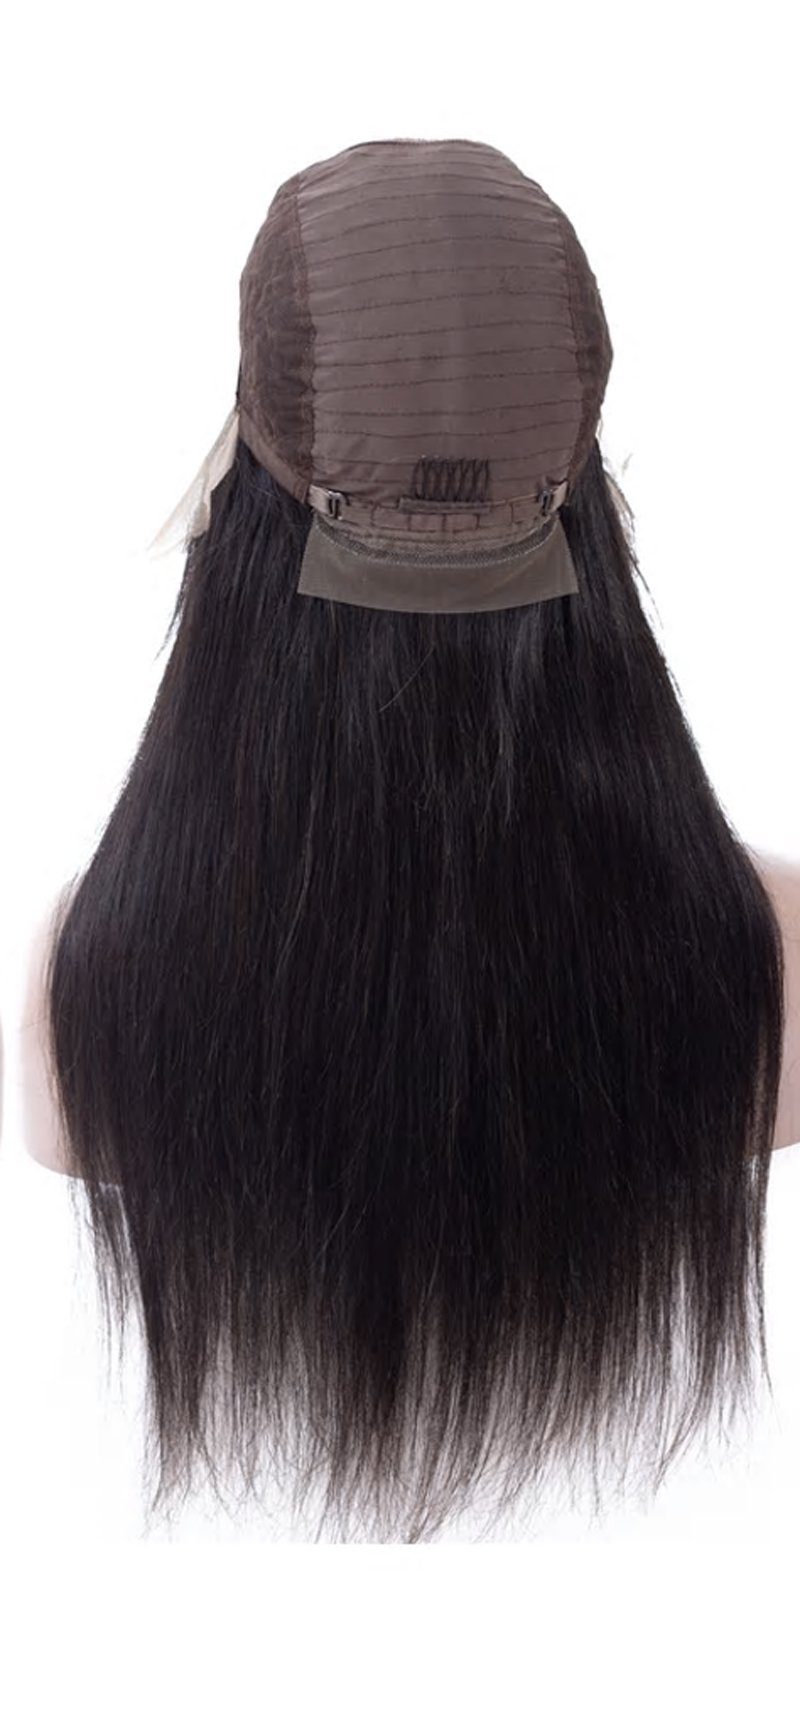 Perruque-360-Cheveux-Lisse-Canada